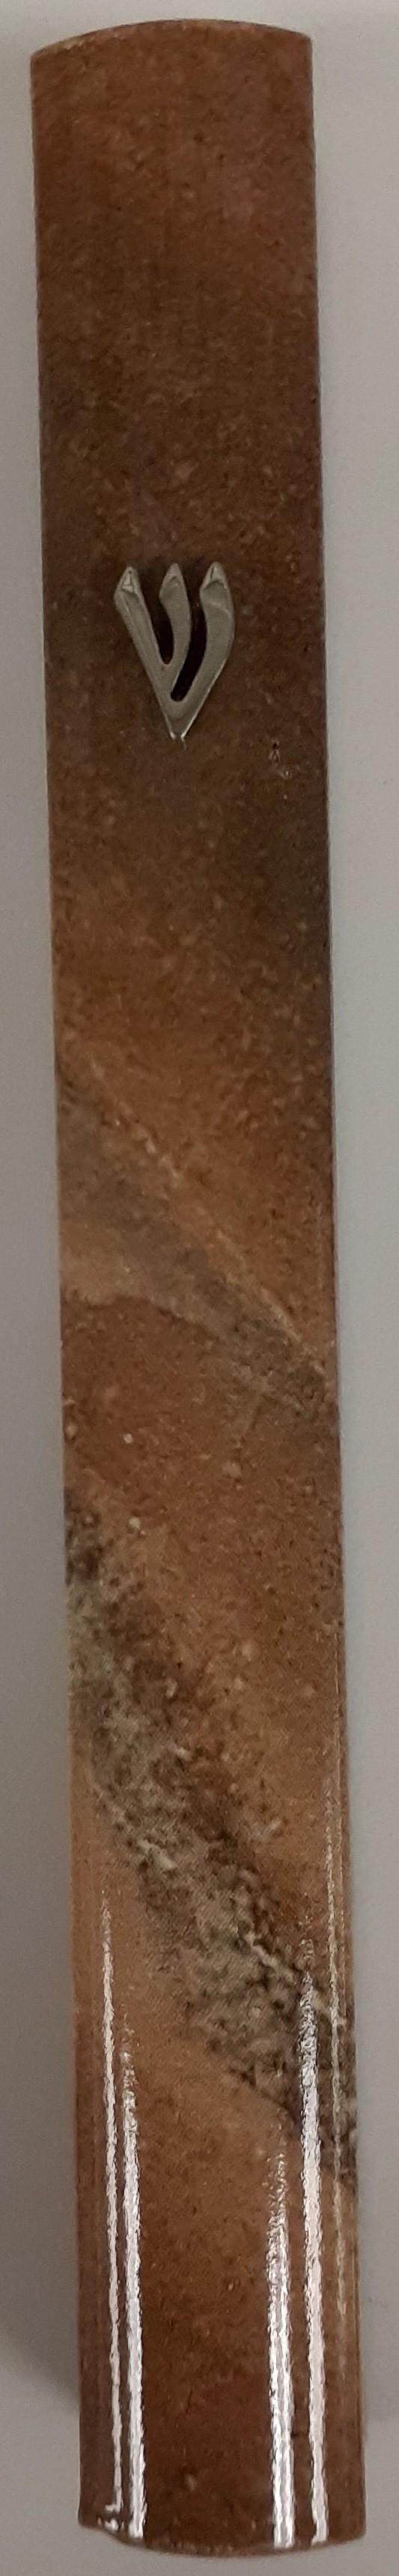 Brown acrylic Mezzuzah with Shin